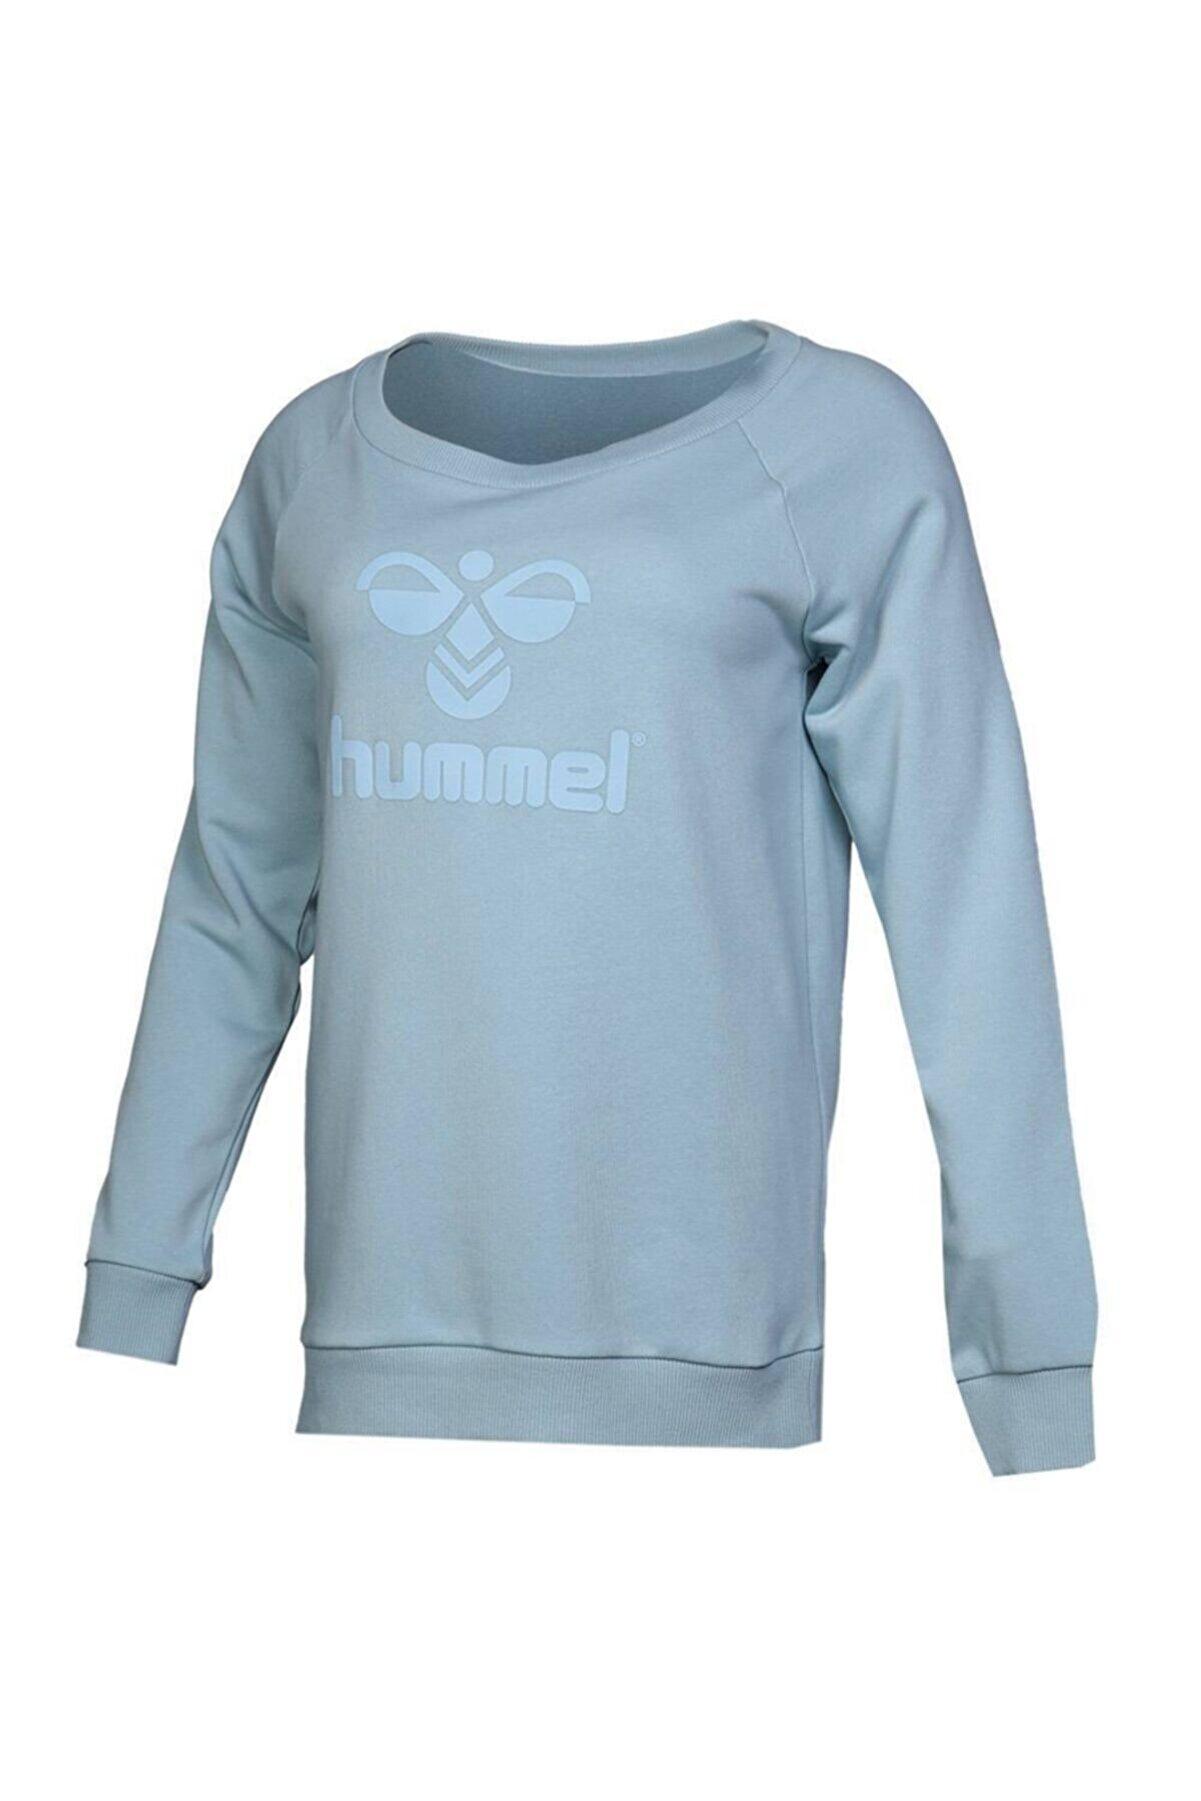 HUMMEL Almeda Mavi Sweatshirt